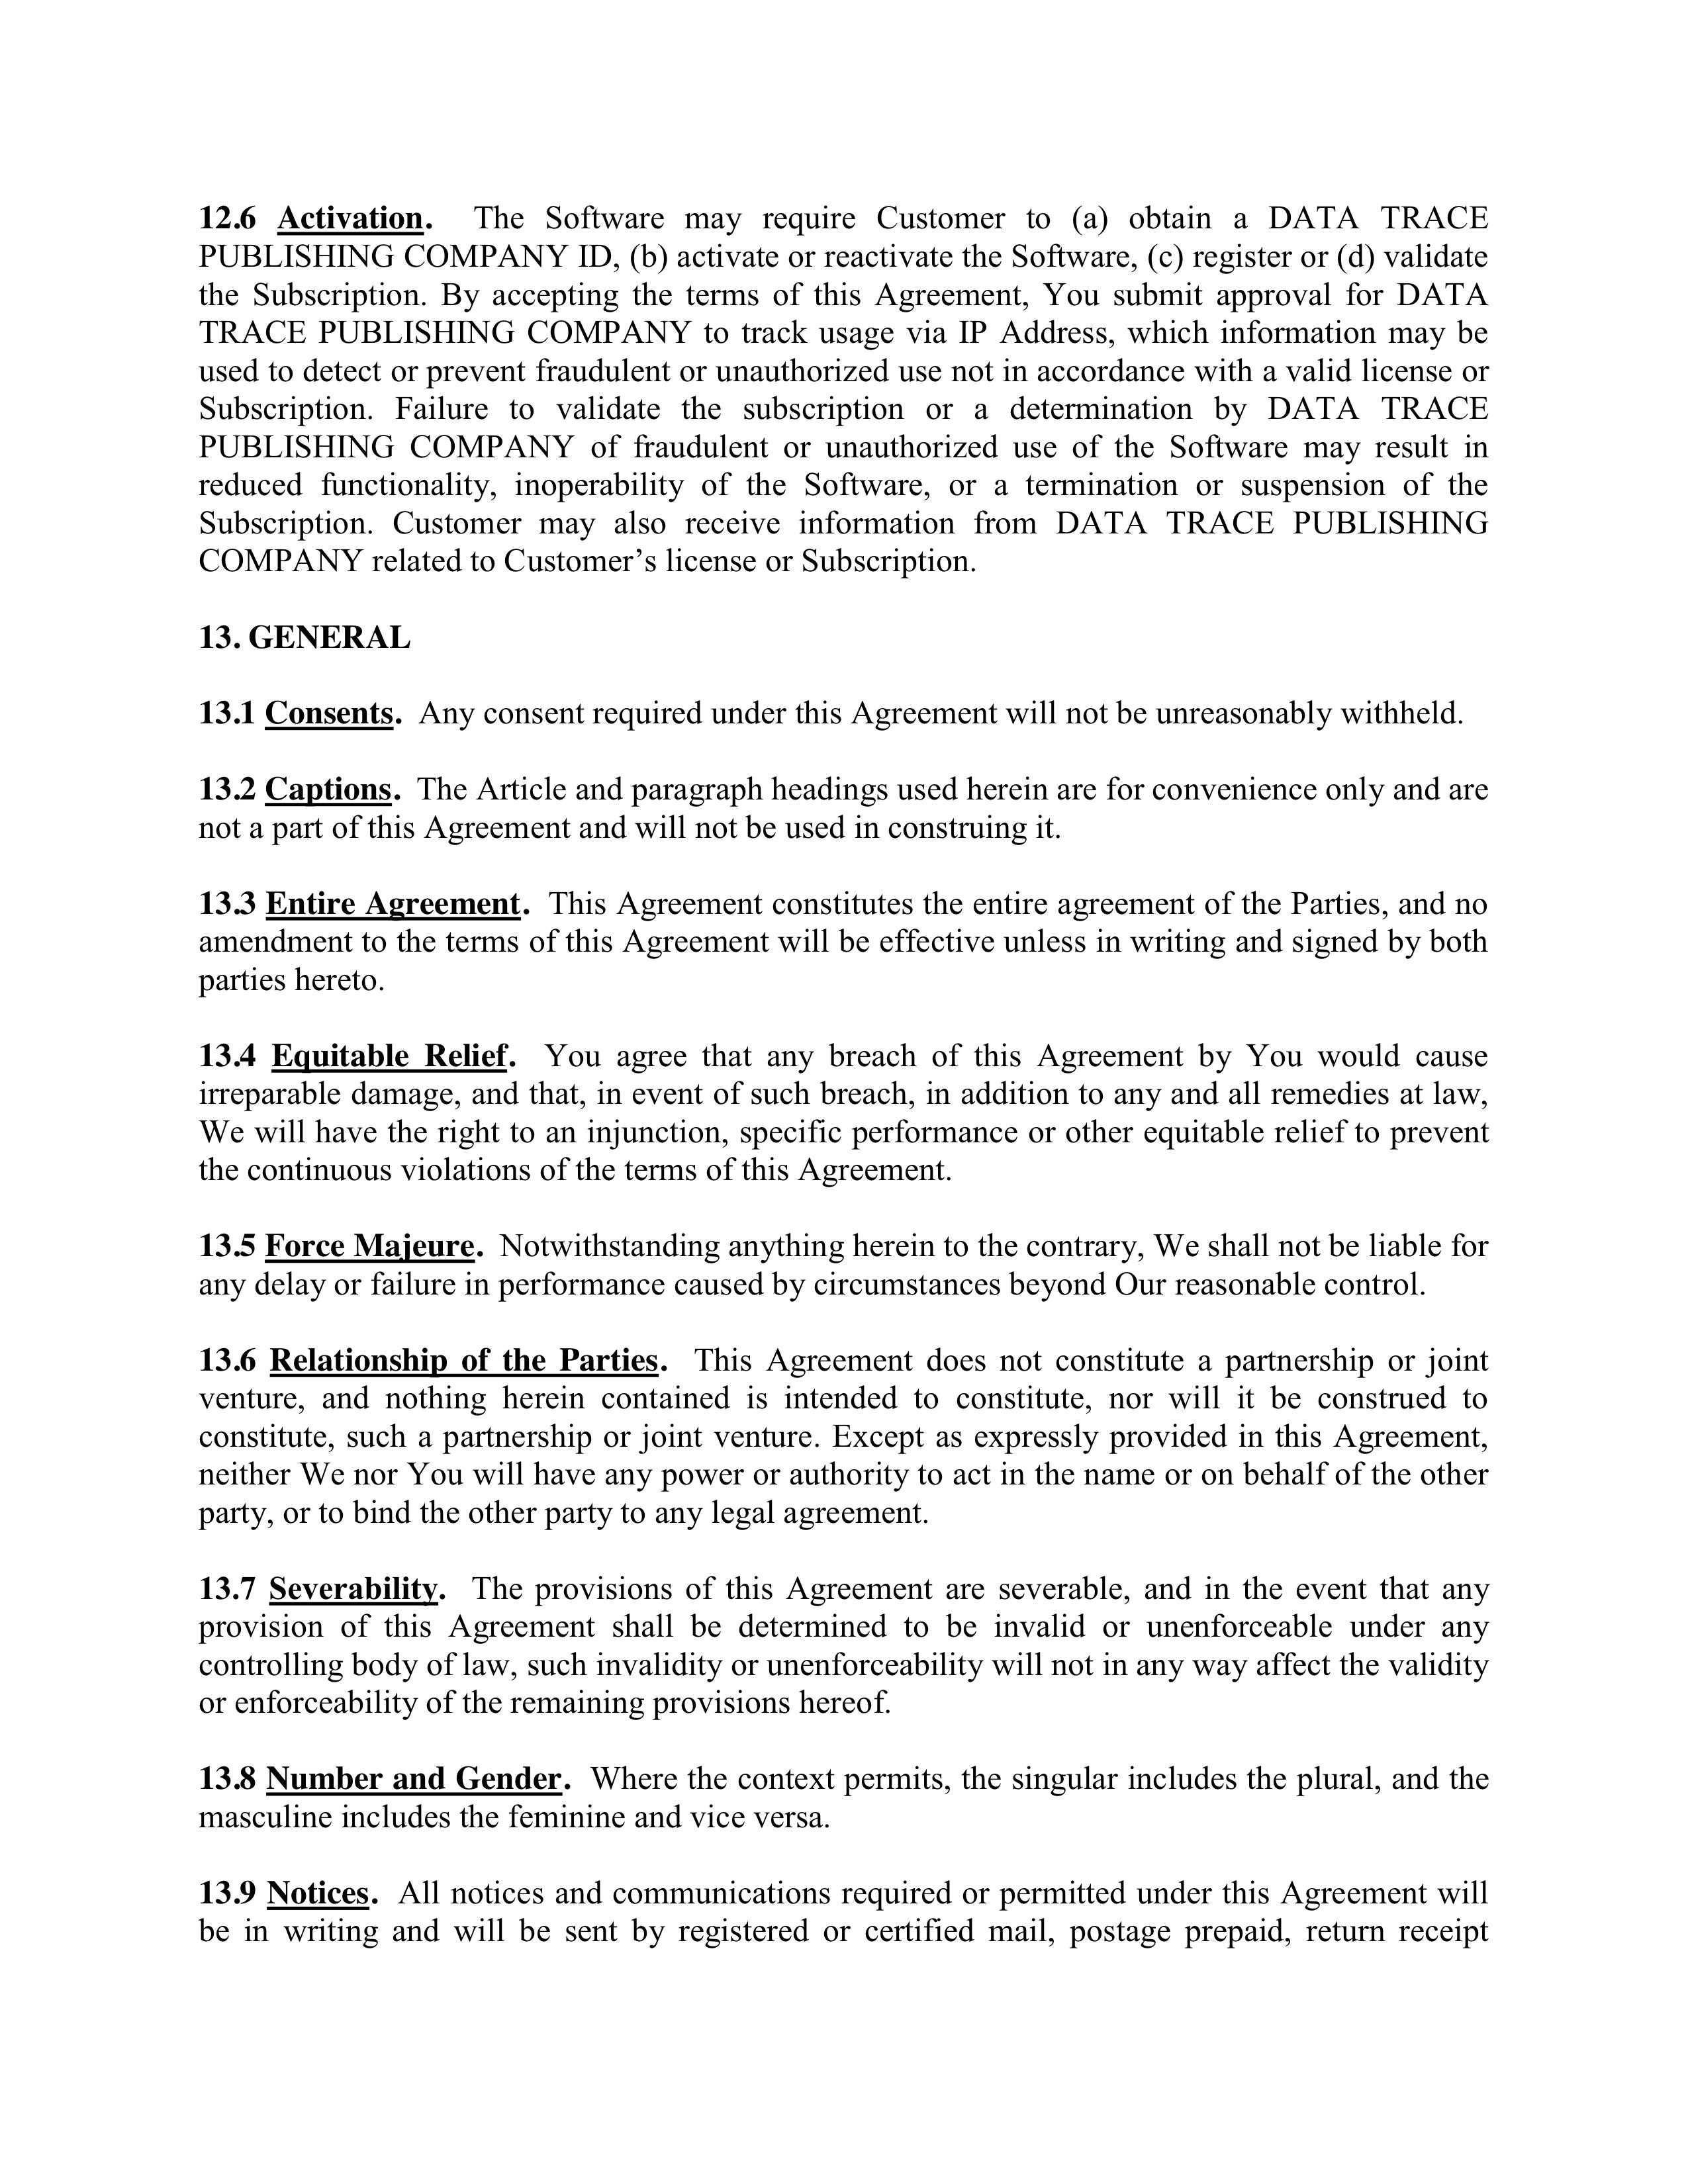 marriage problems essay neighborhood